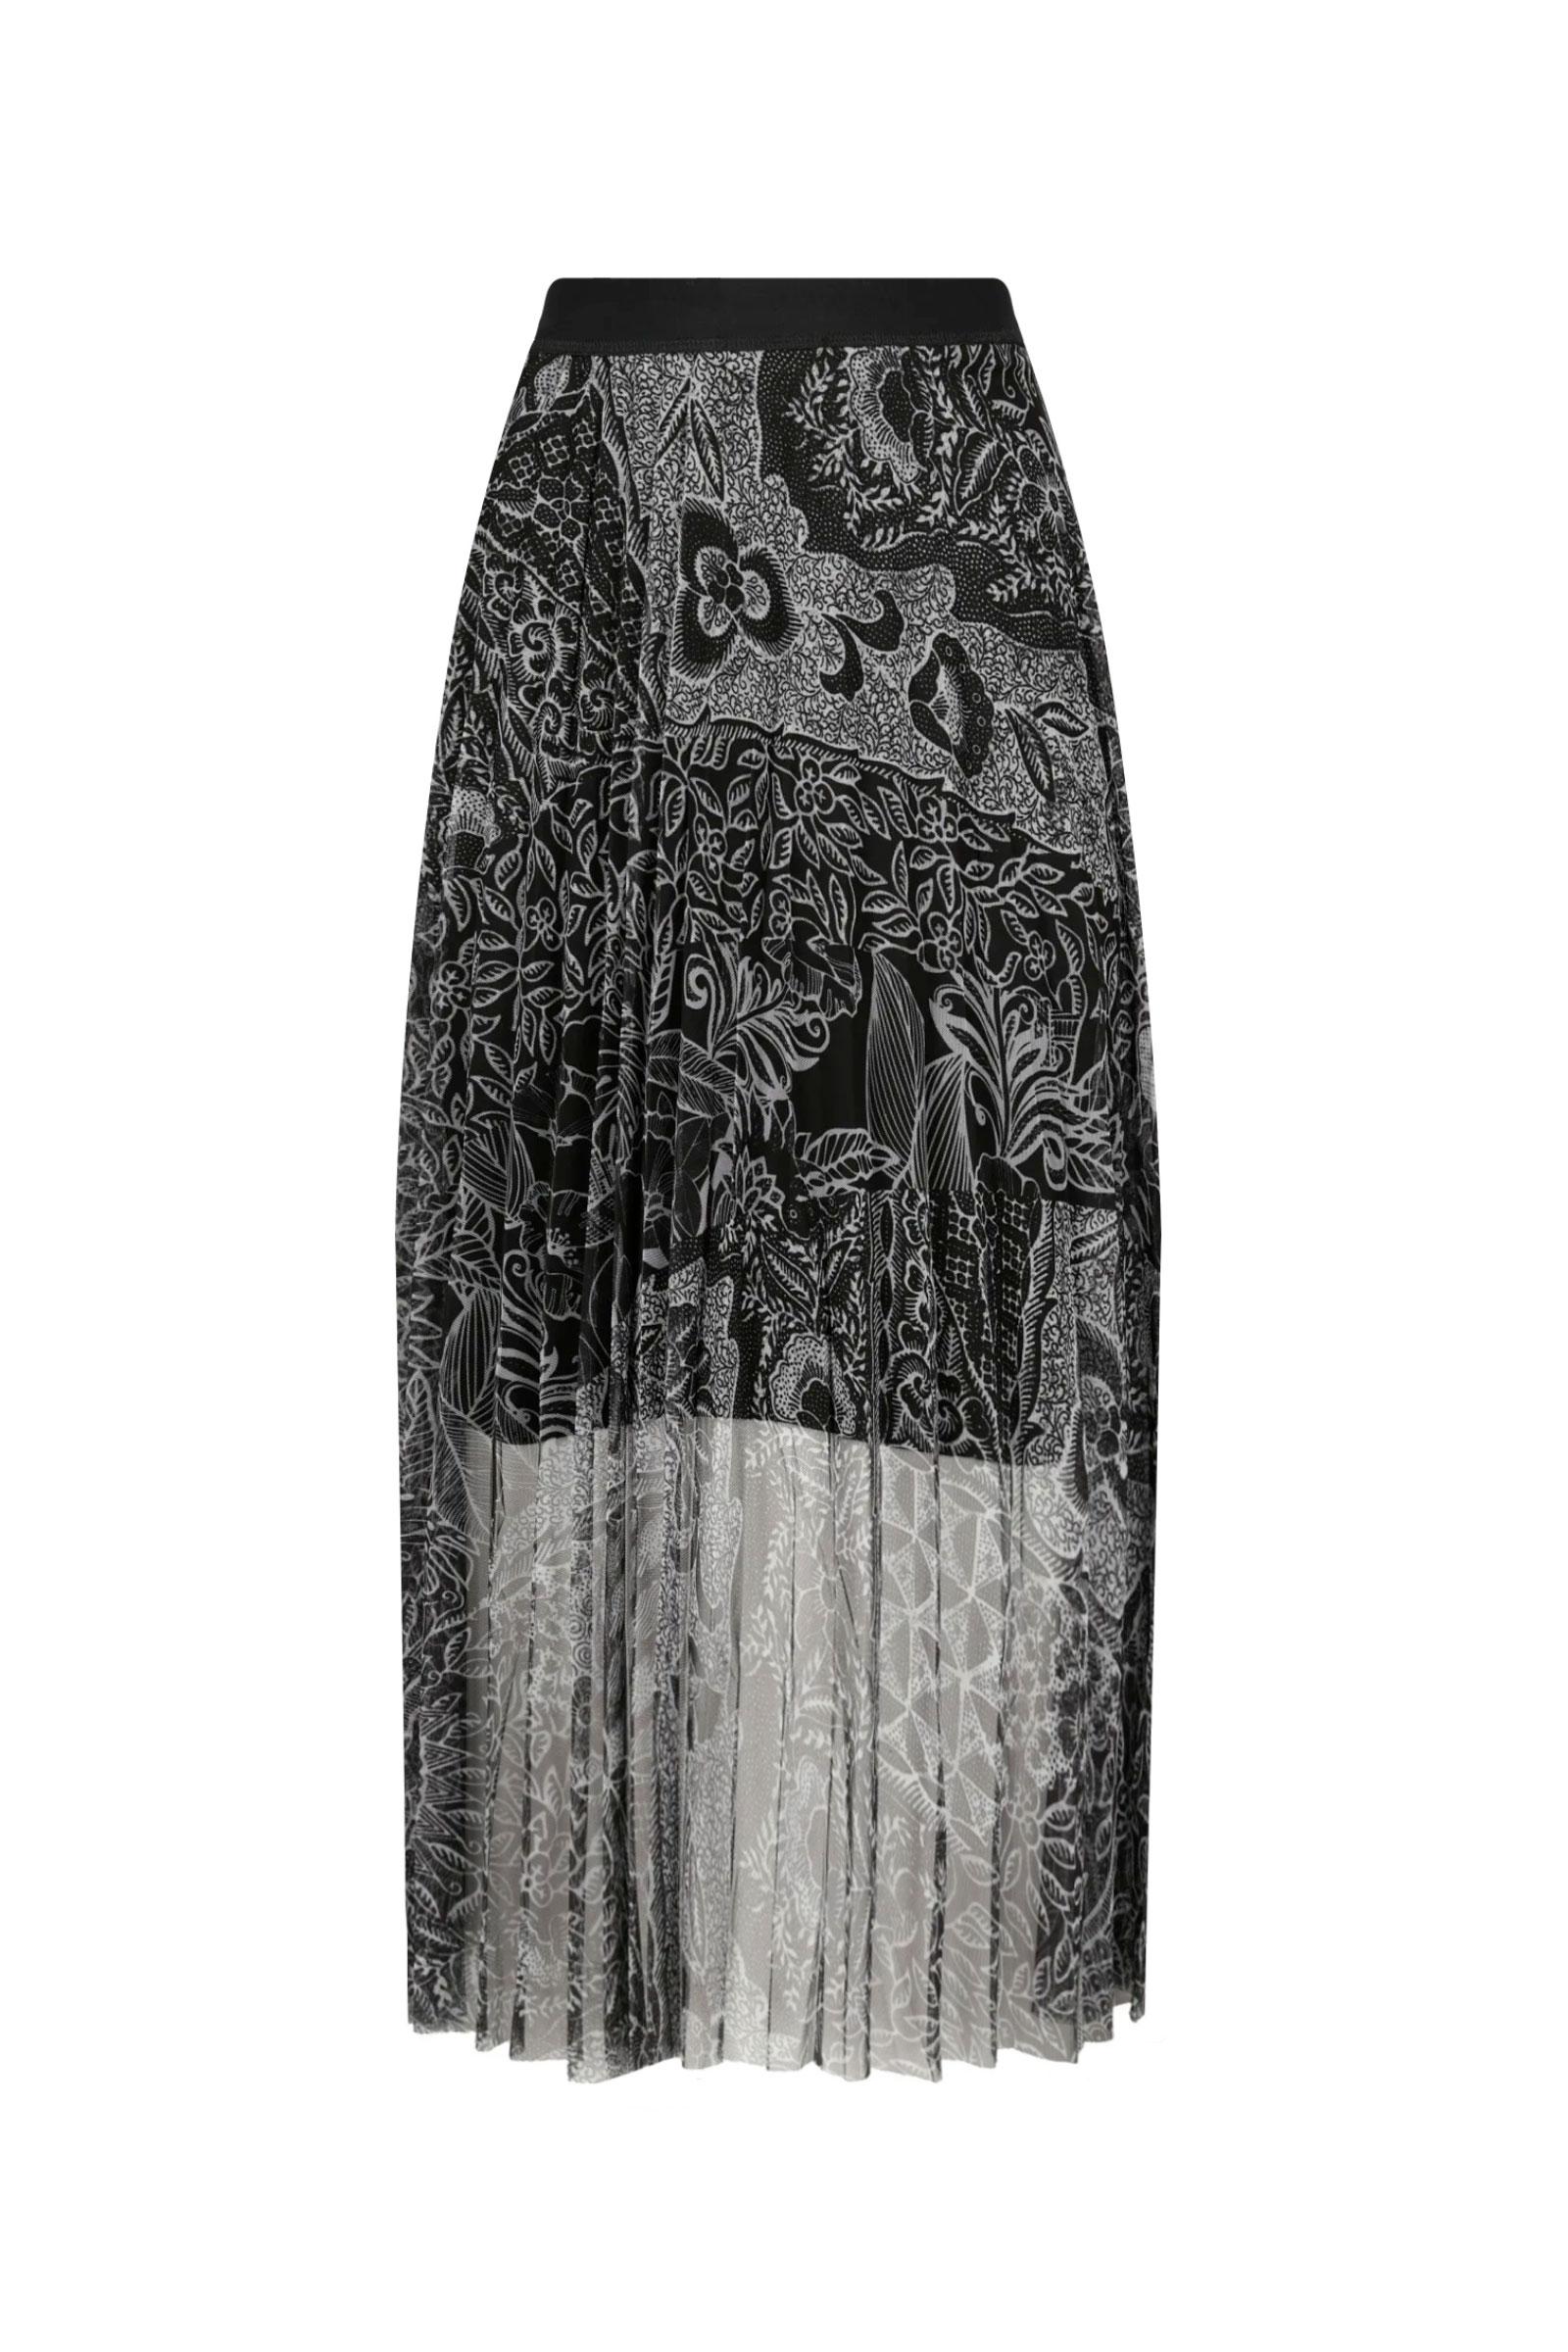 DESIGUAL FABIOLA Model Skirt DESIGUAL   Skirt   20WWFK142000